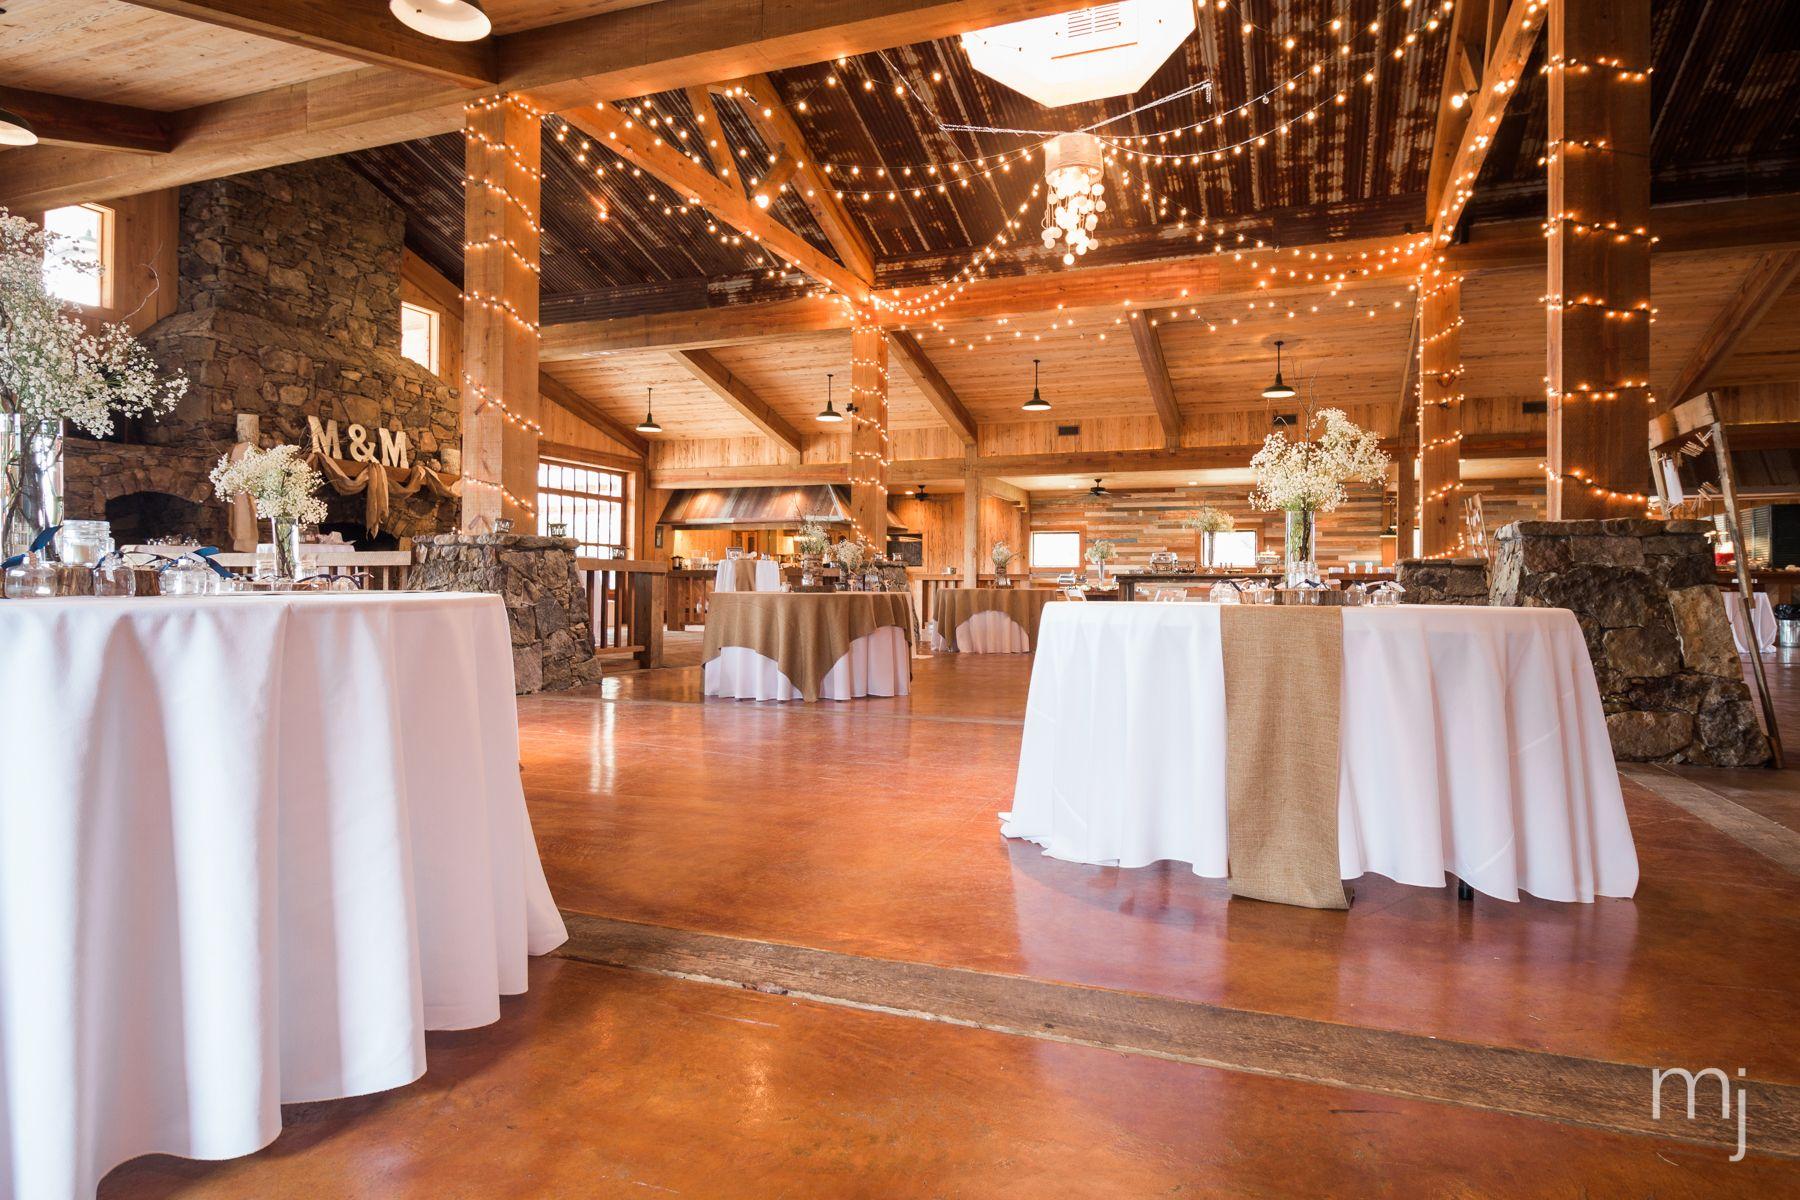 Decorative lights for weddings - Informal Reception Setting Rustic Barn Wedding With Decorative Christmas Lights Venue Hewlett Barn